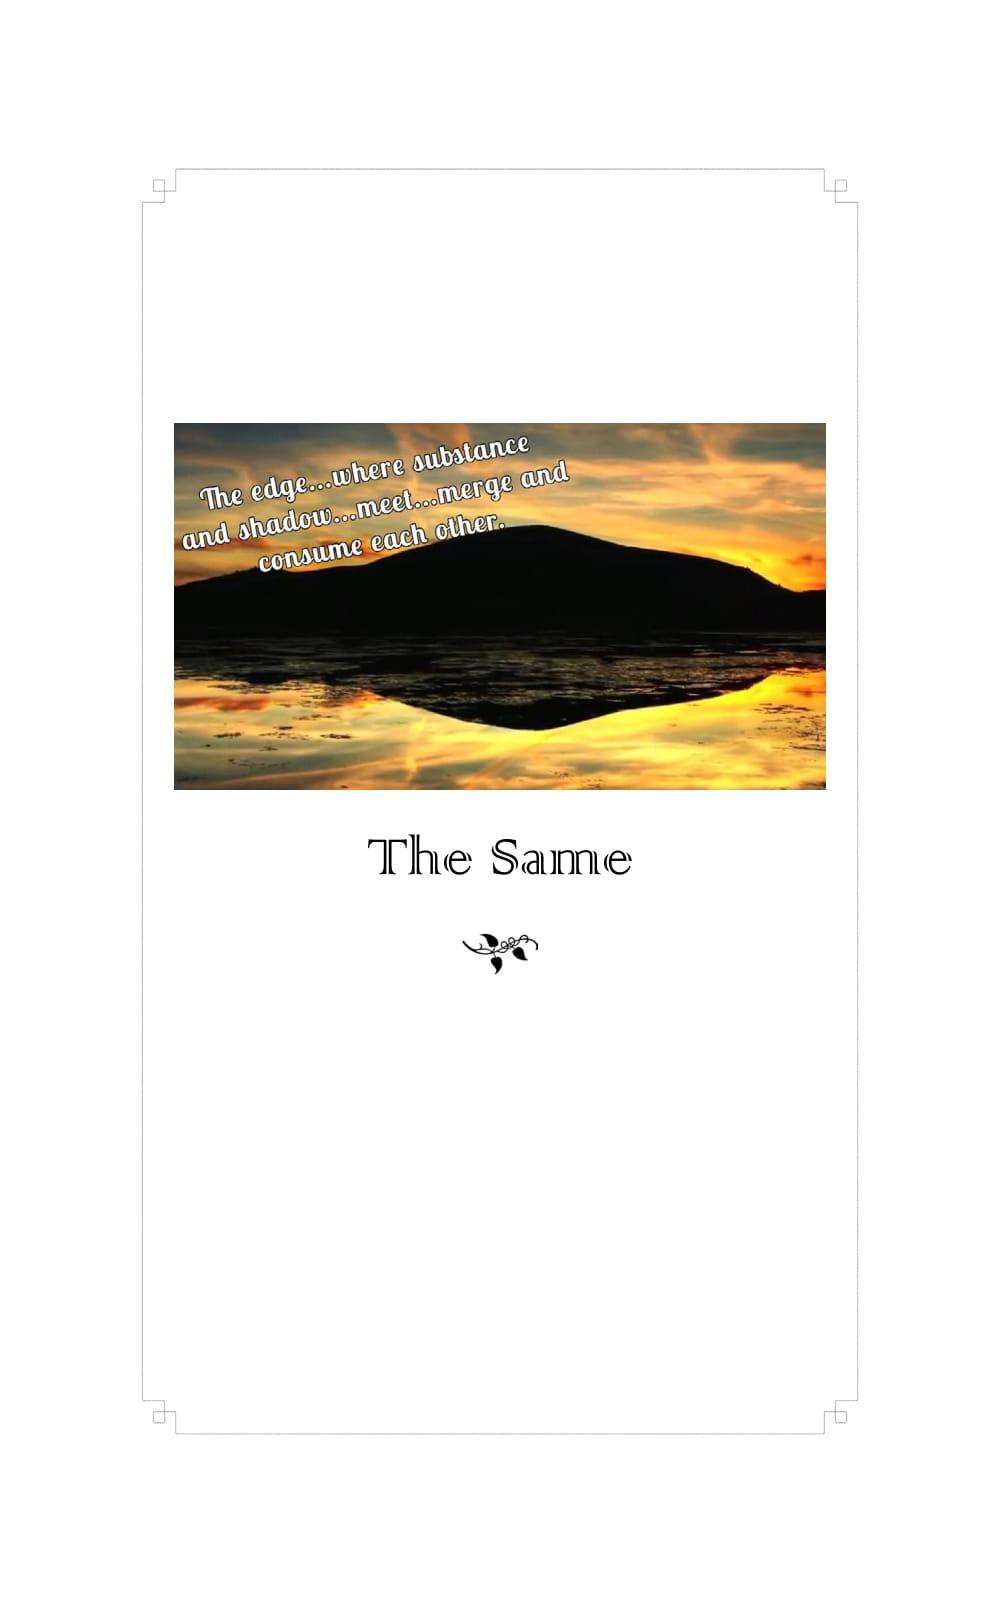 Musings-of-the-Awakening-Soul-Book-By-Dr-Pallavi-Kwatra-259.jpg